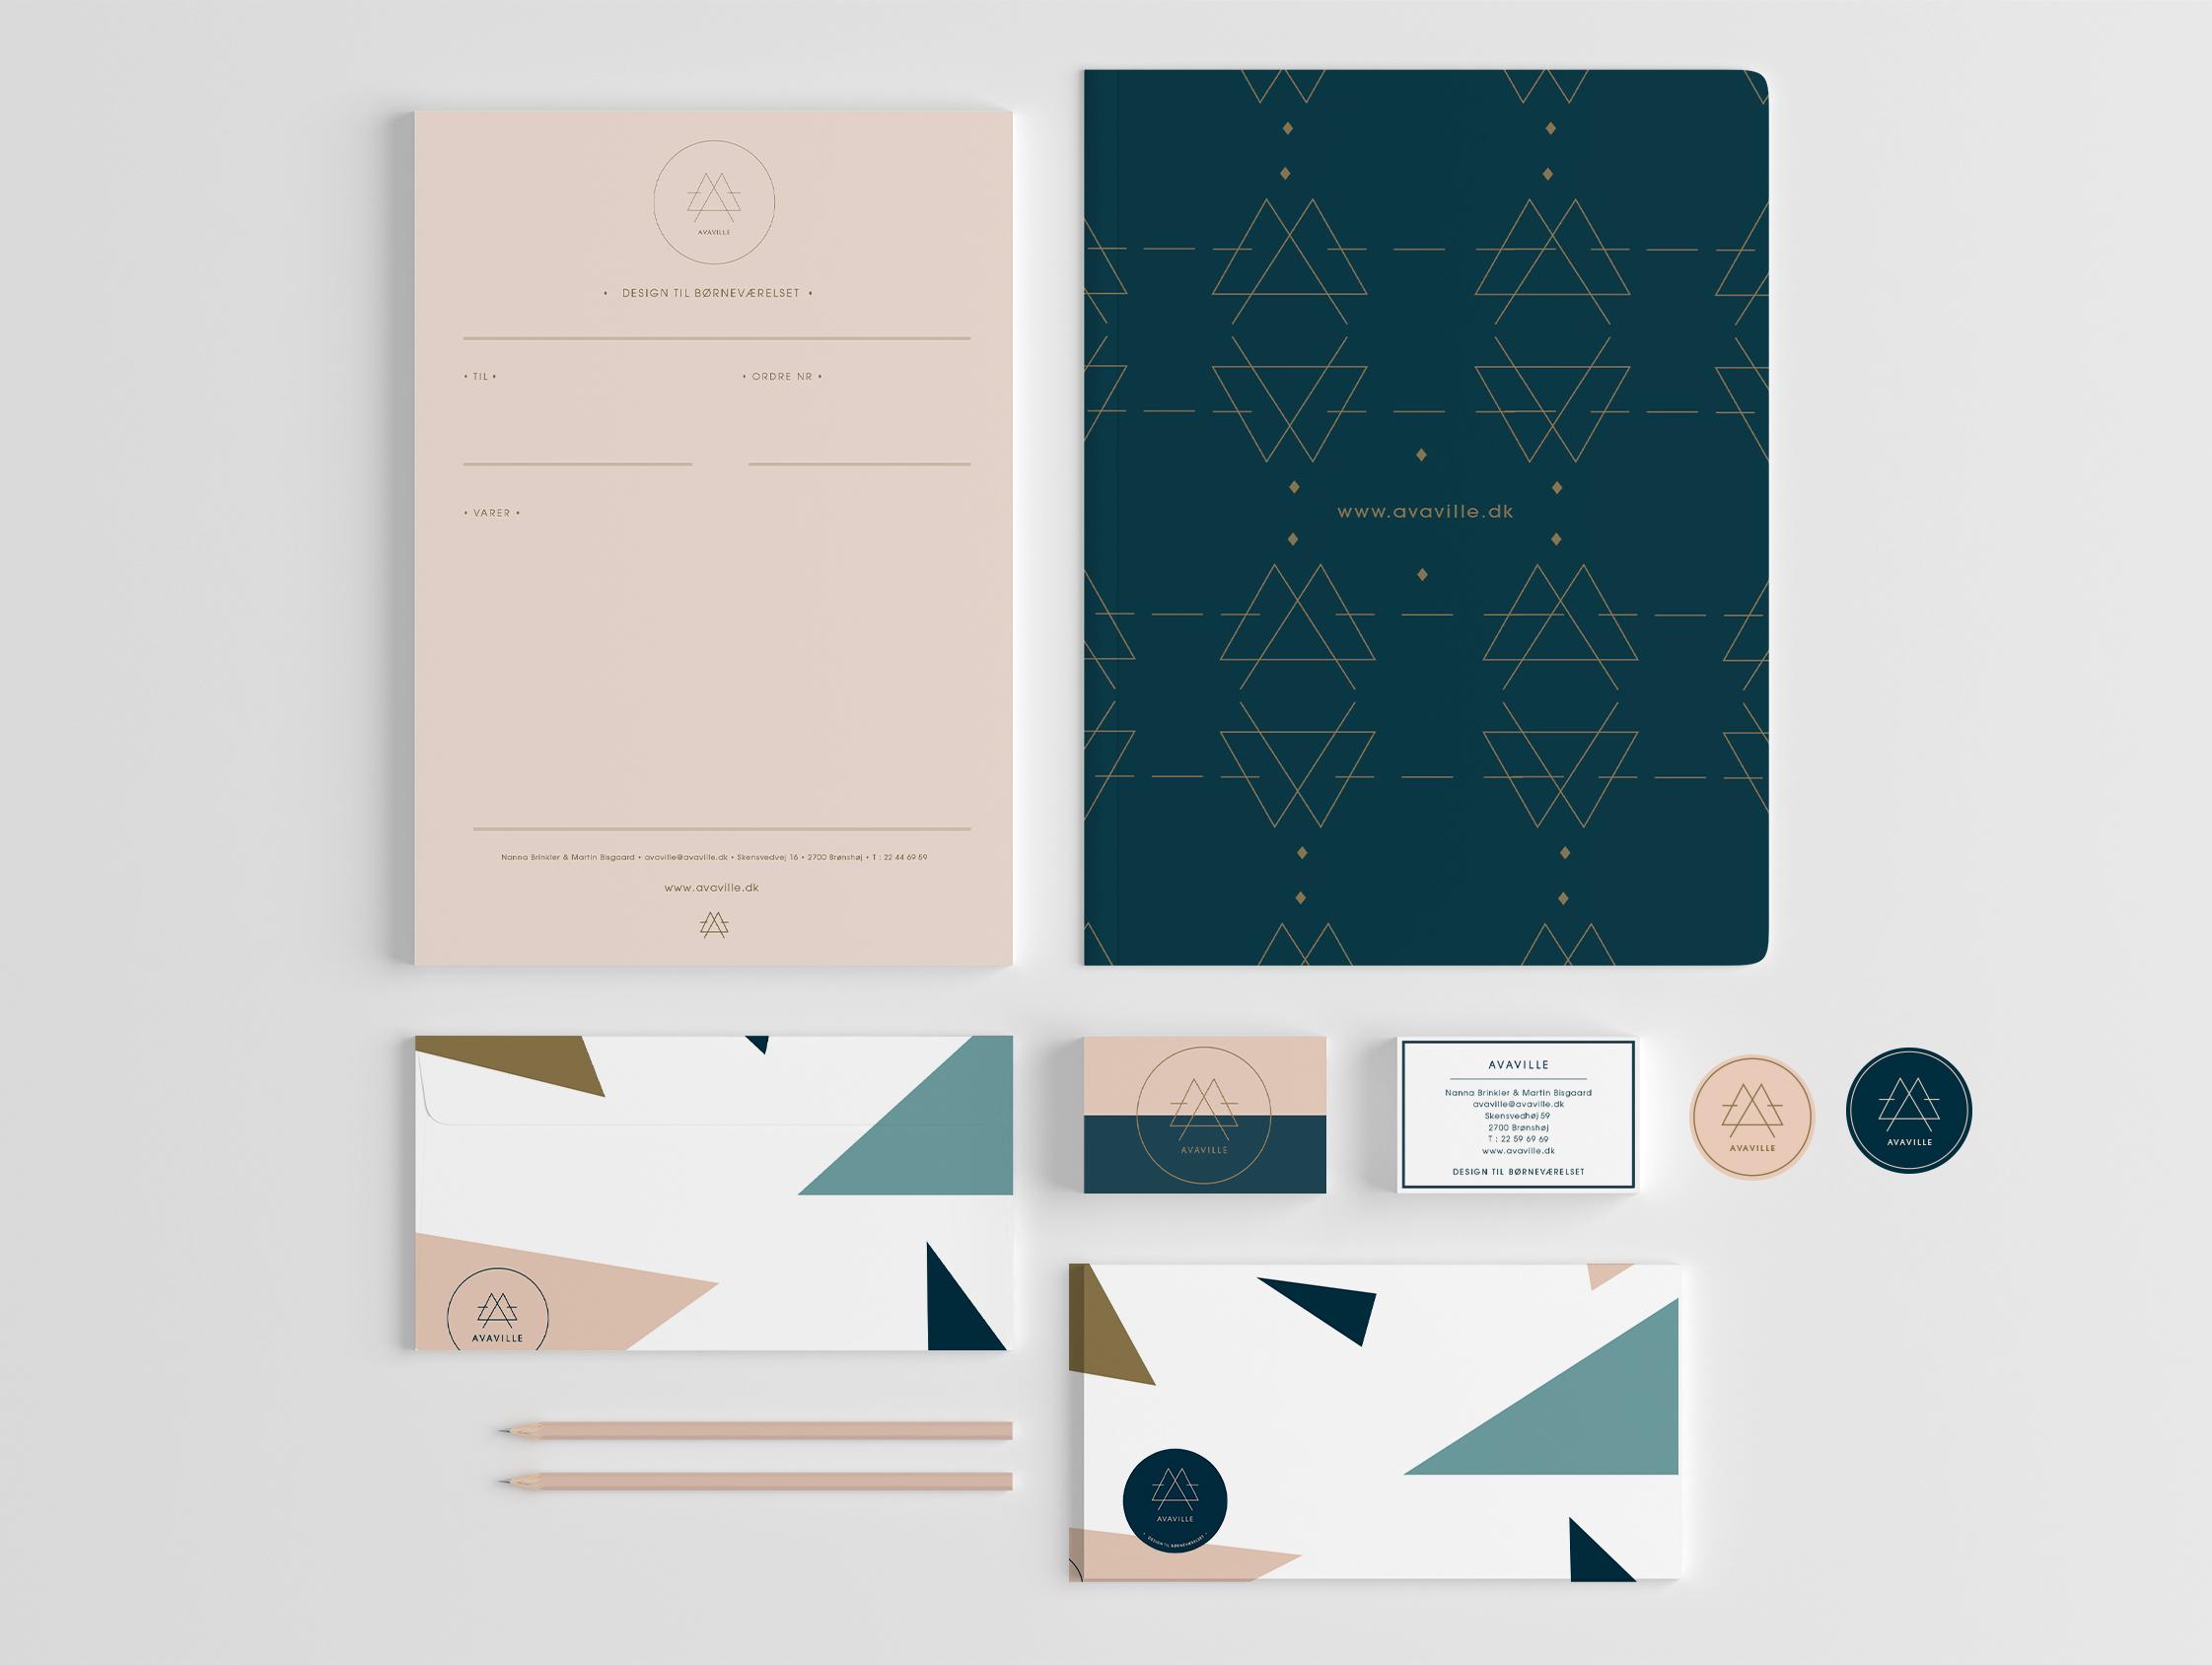 BINESJOMO GRAFISK DESIGN WEB